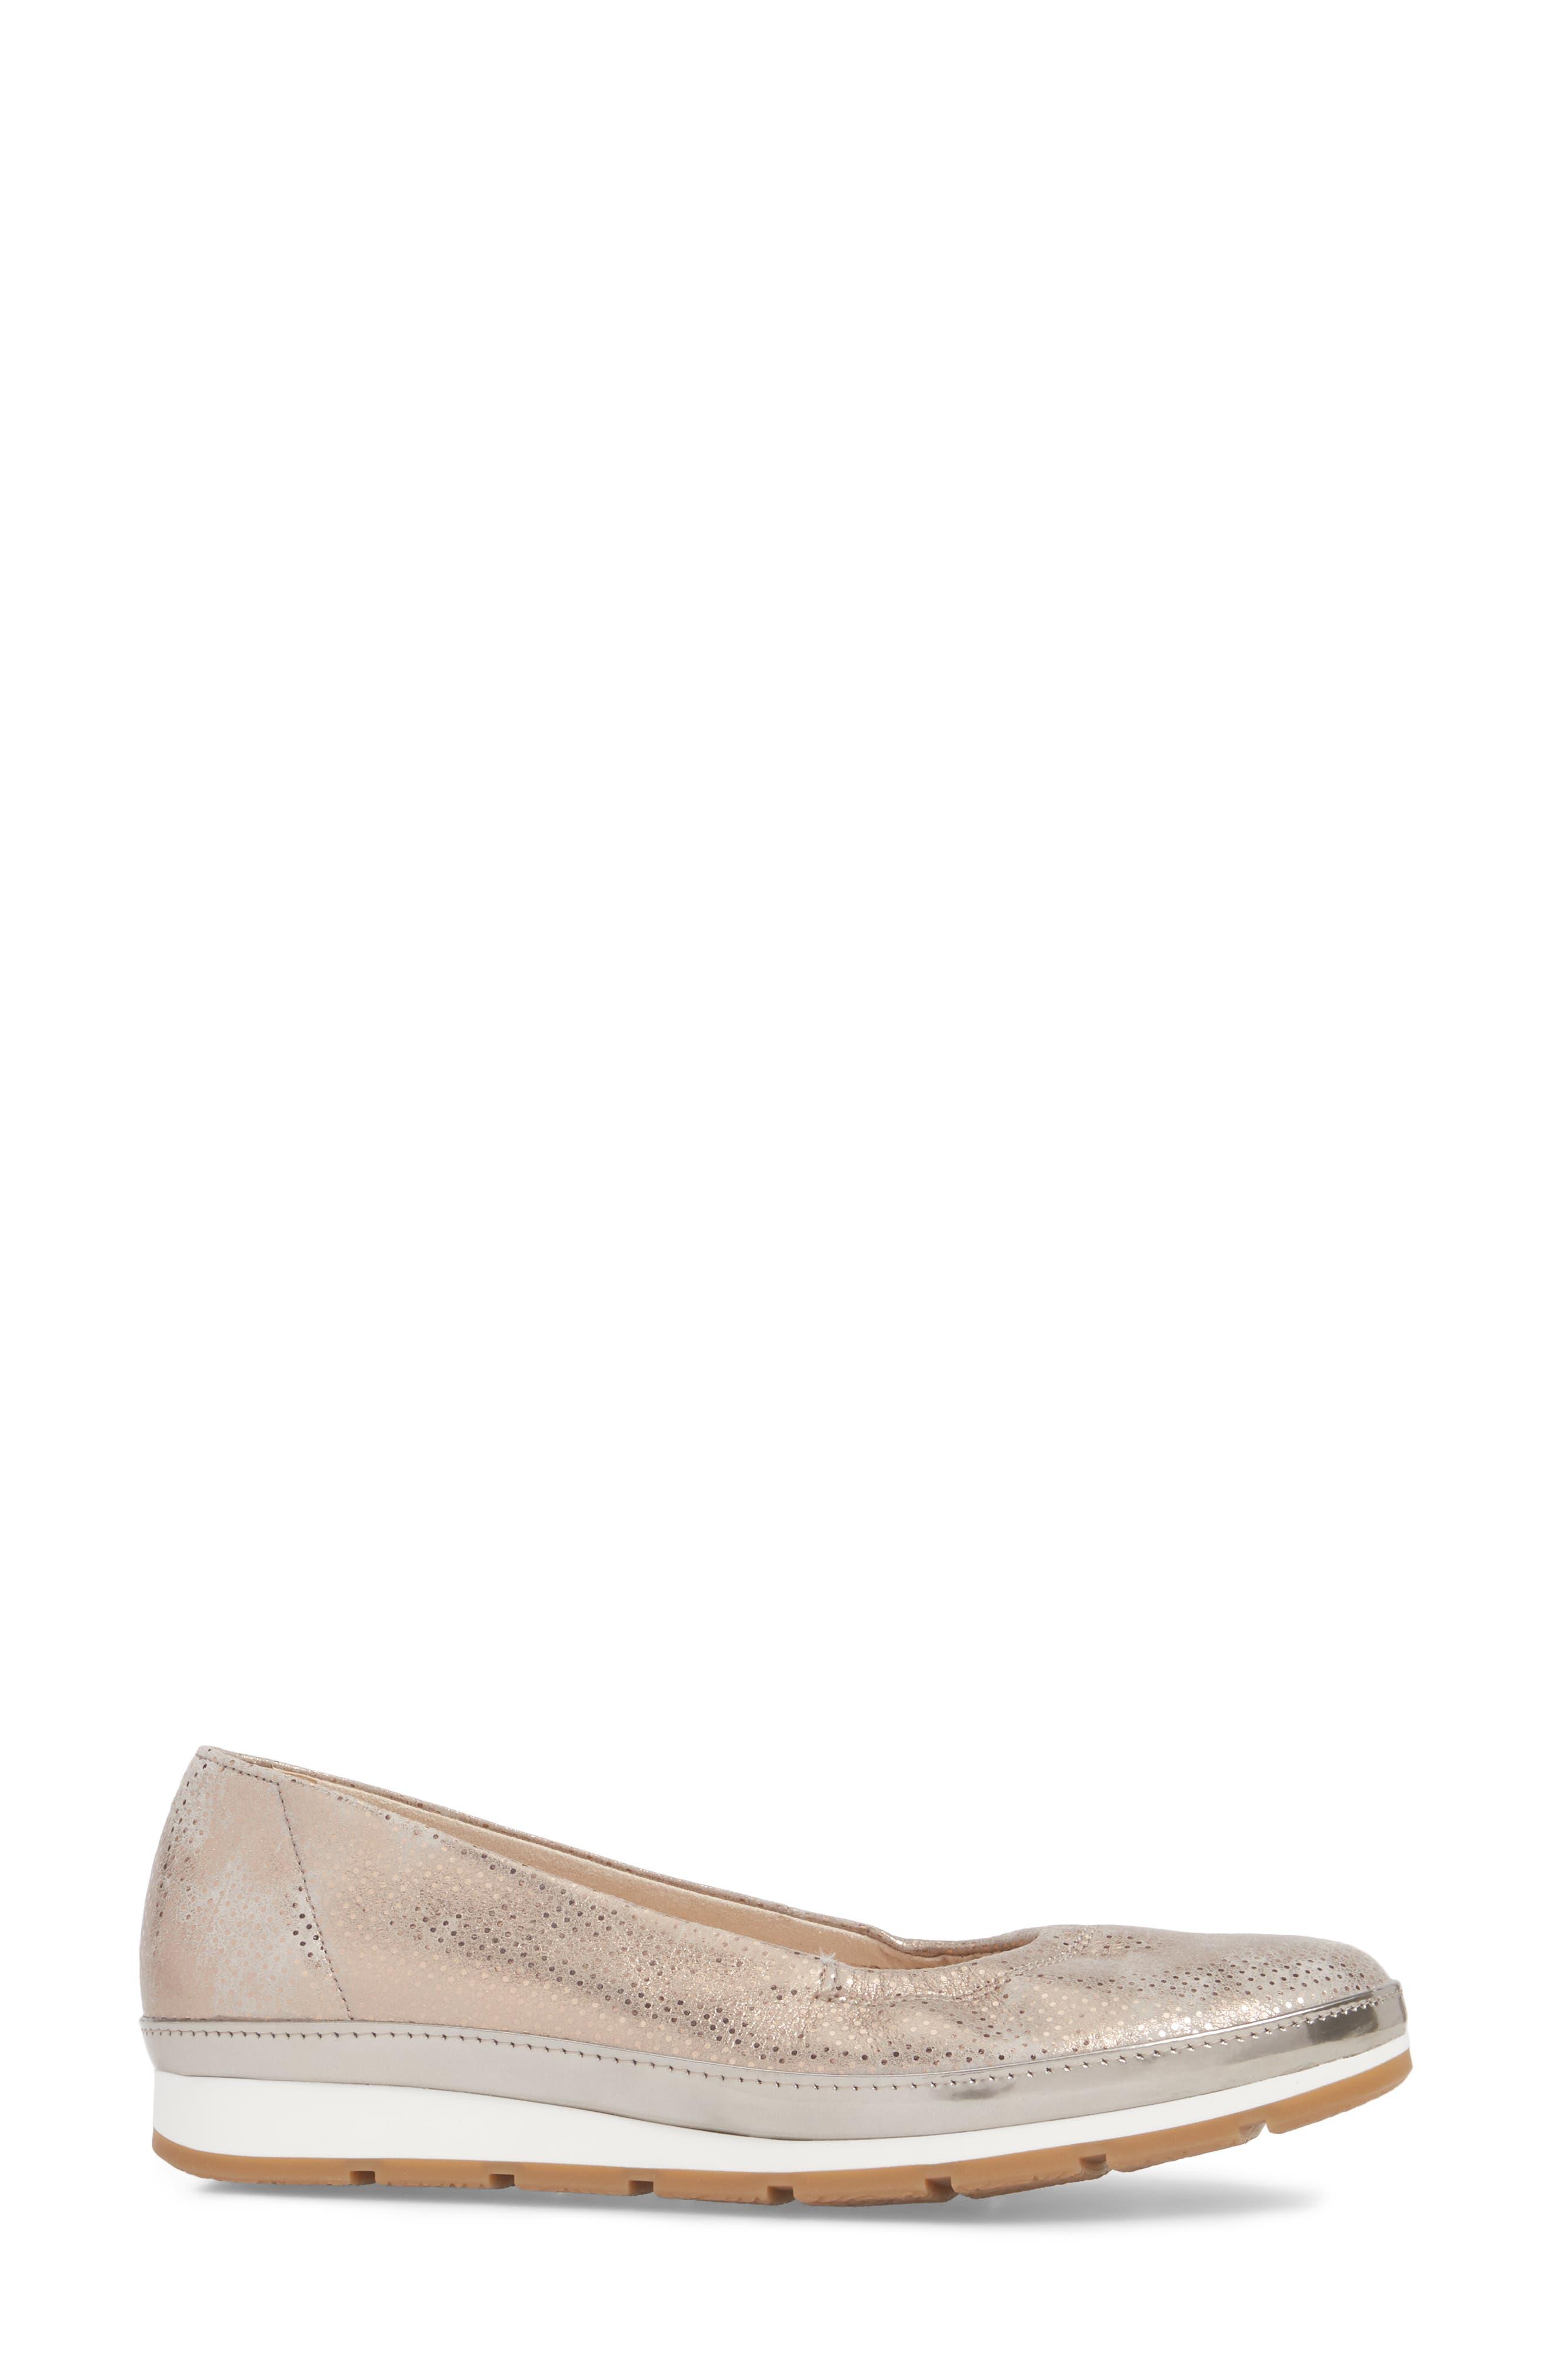 Ballet Wedge,                             Alternate thumbnail 3, color,                             Beige Metallic Leather